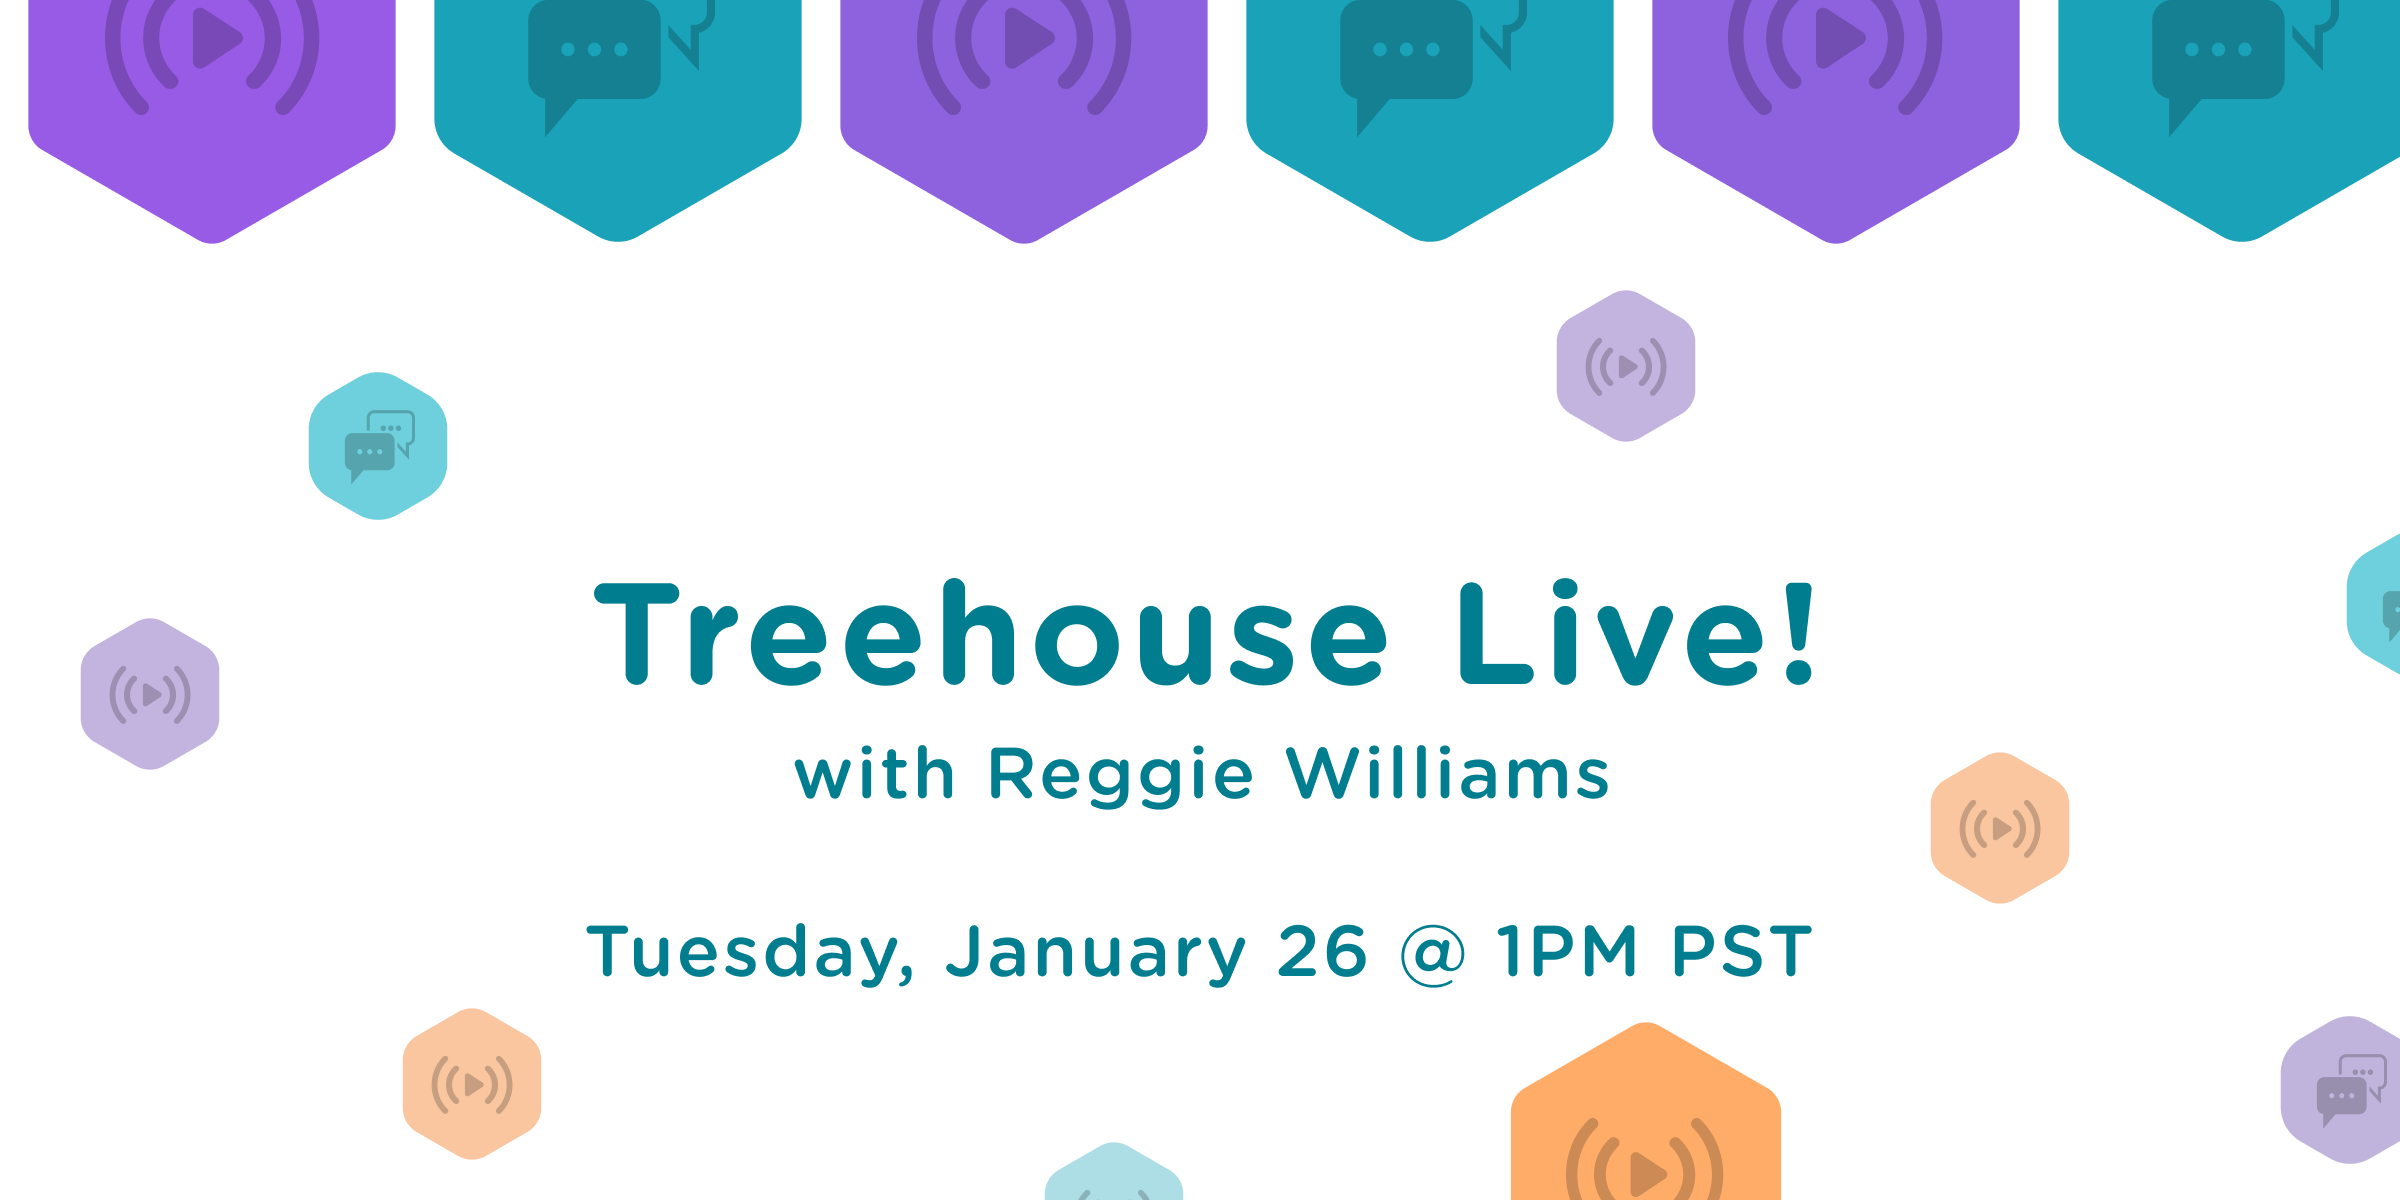 Treehouse Live